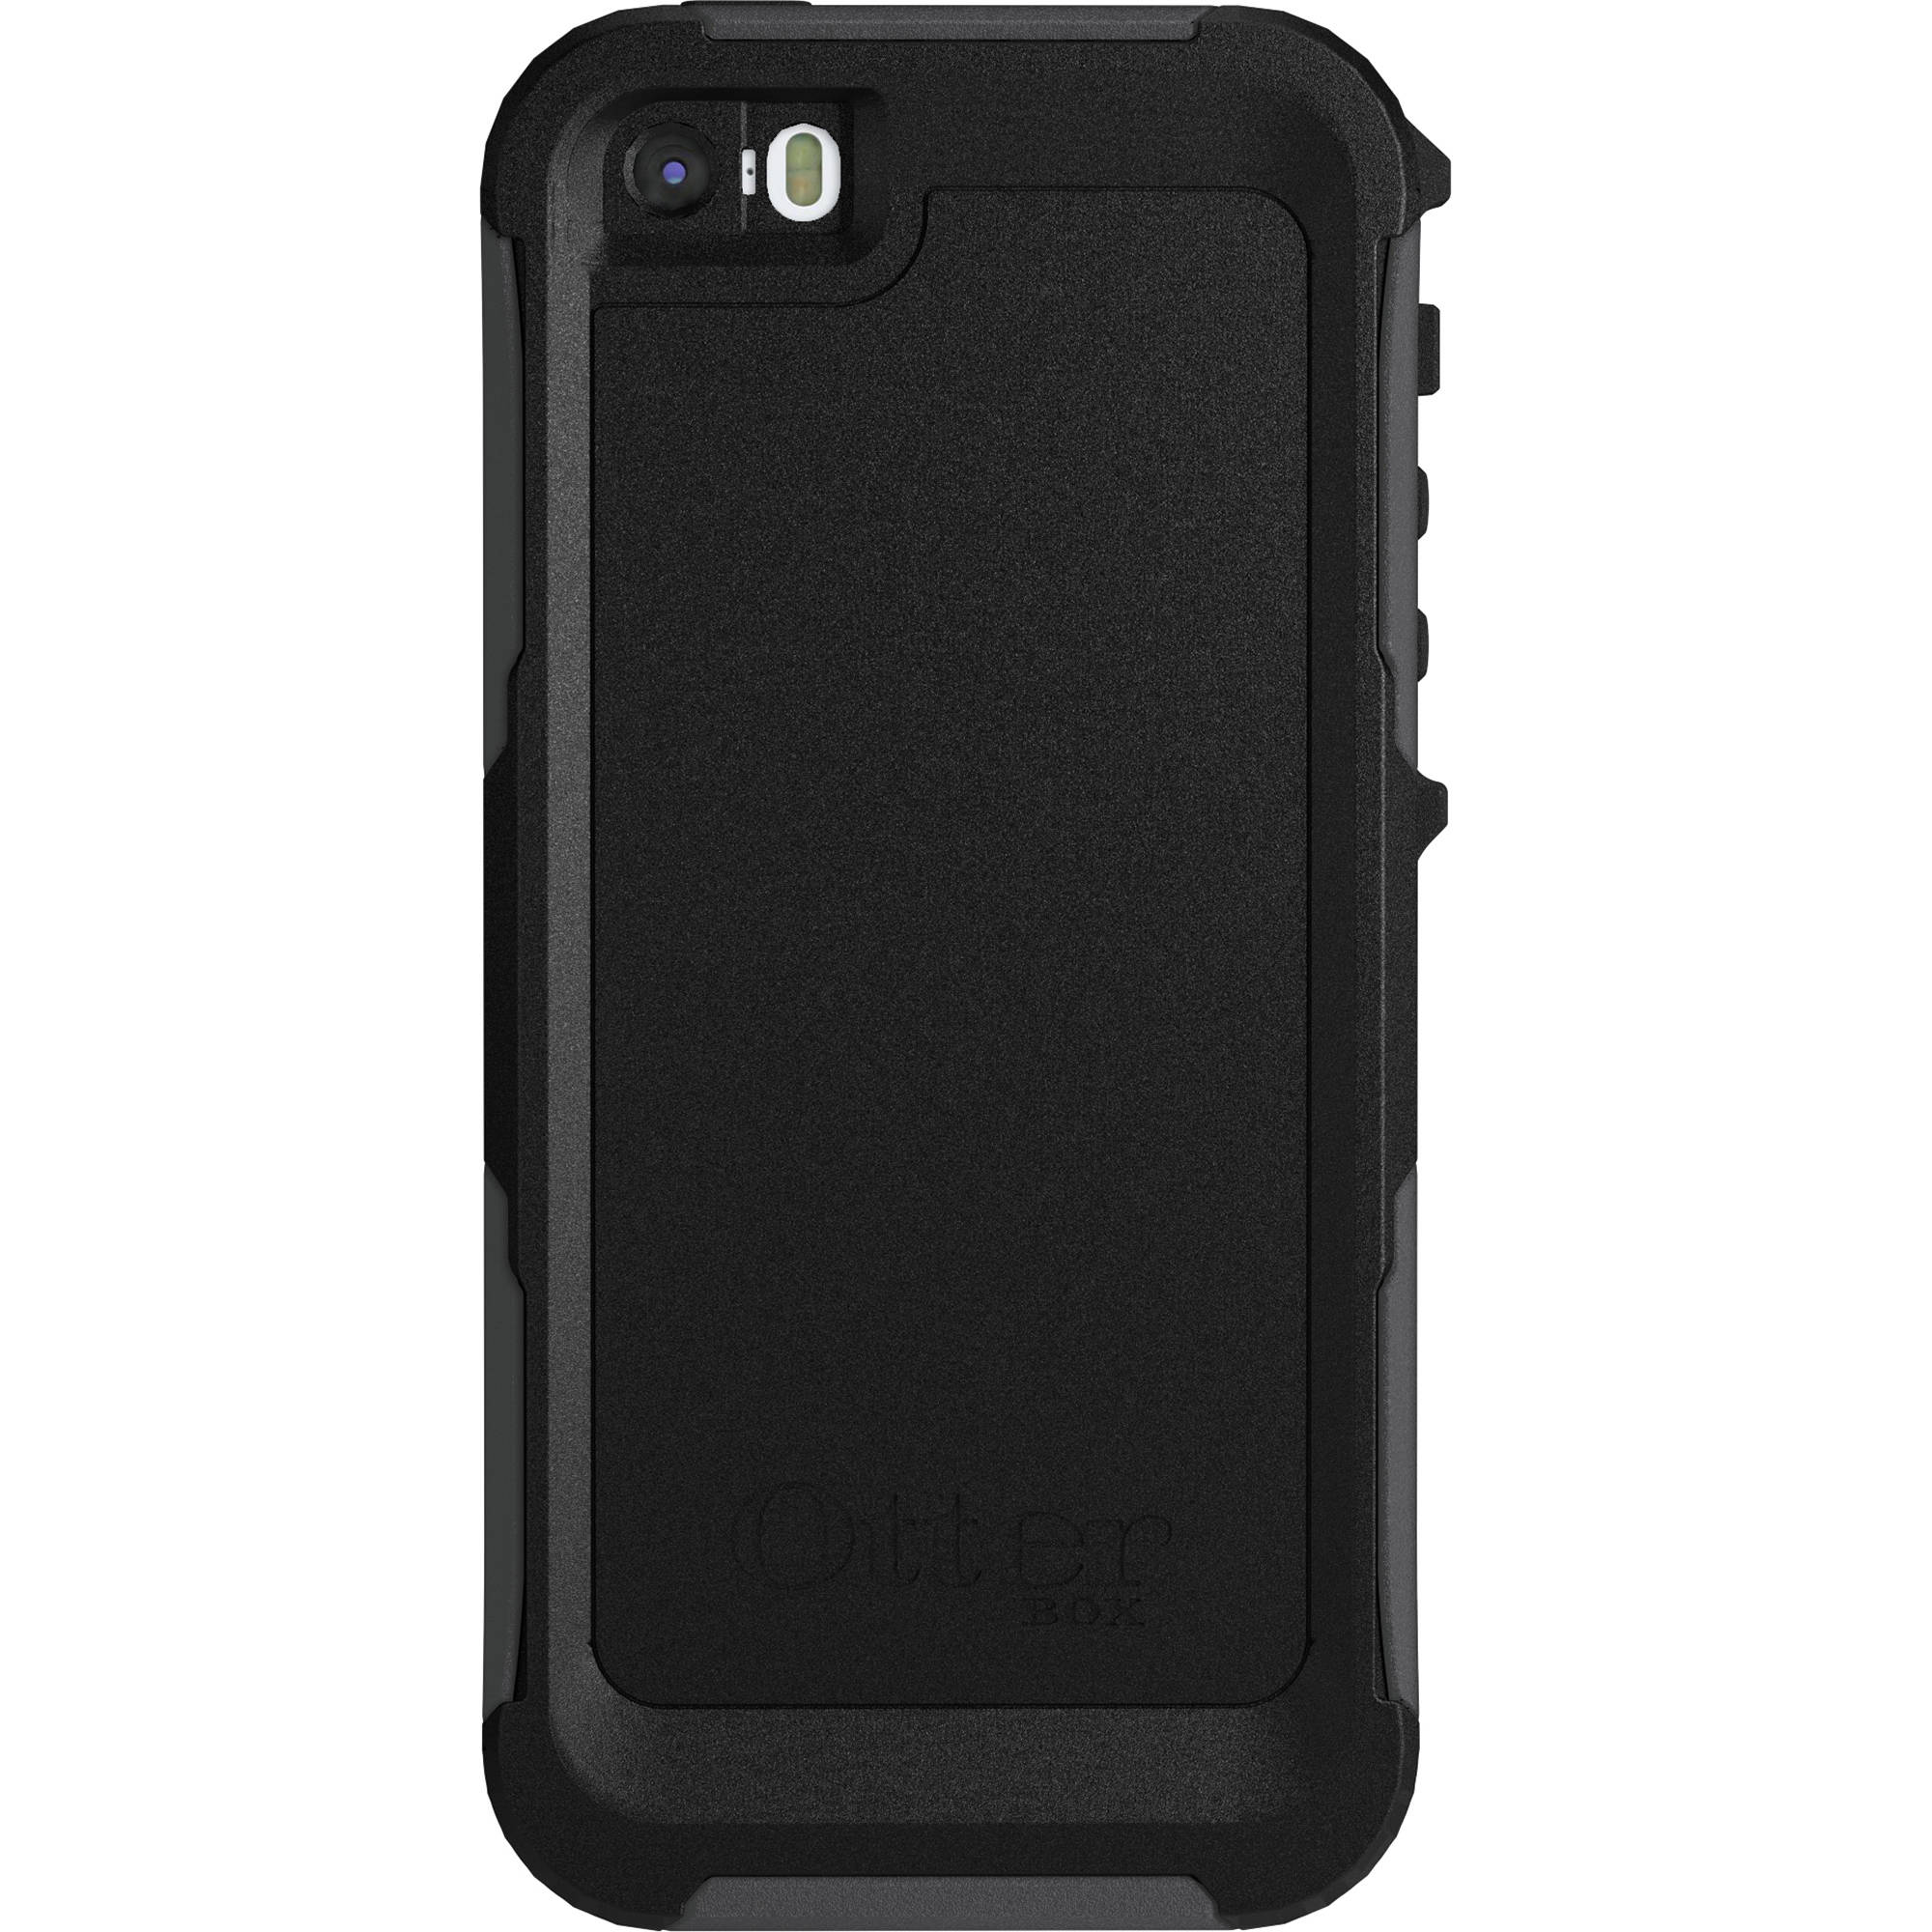 iPhone 5/5SE/5S Otterbox apple iphone case preserver series